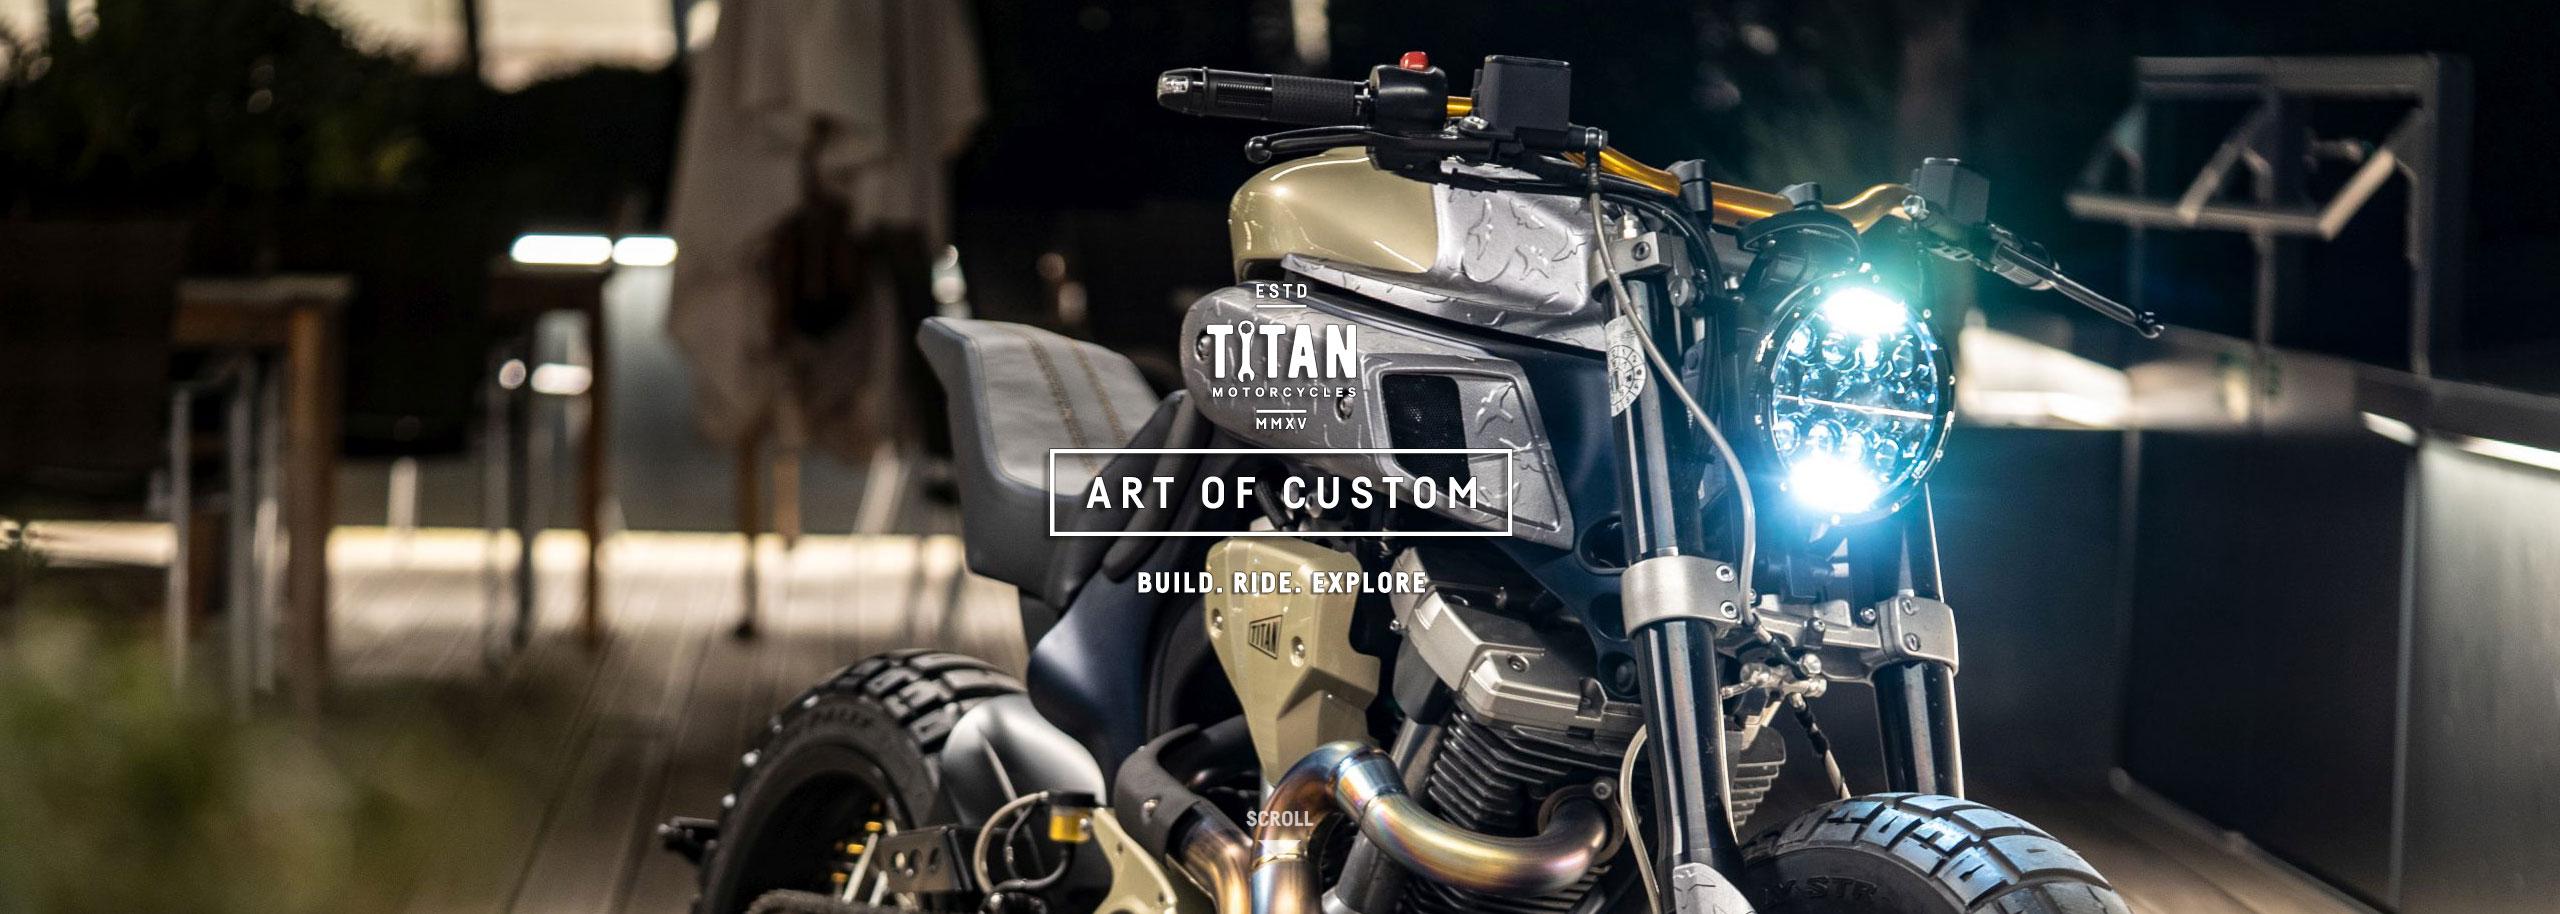 TITAN-Motorcycle-Cafe-Racer-Austria-Custom-Bike-Styria-Yamaha-MT-01_01